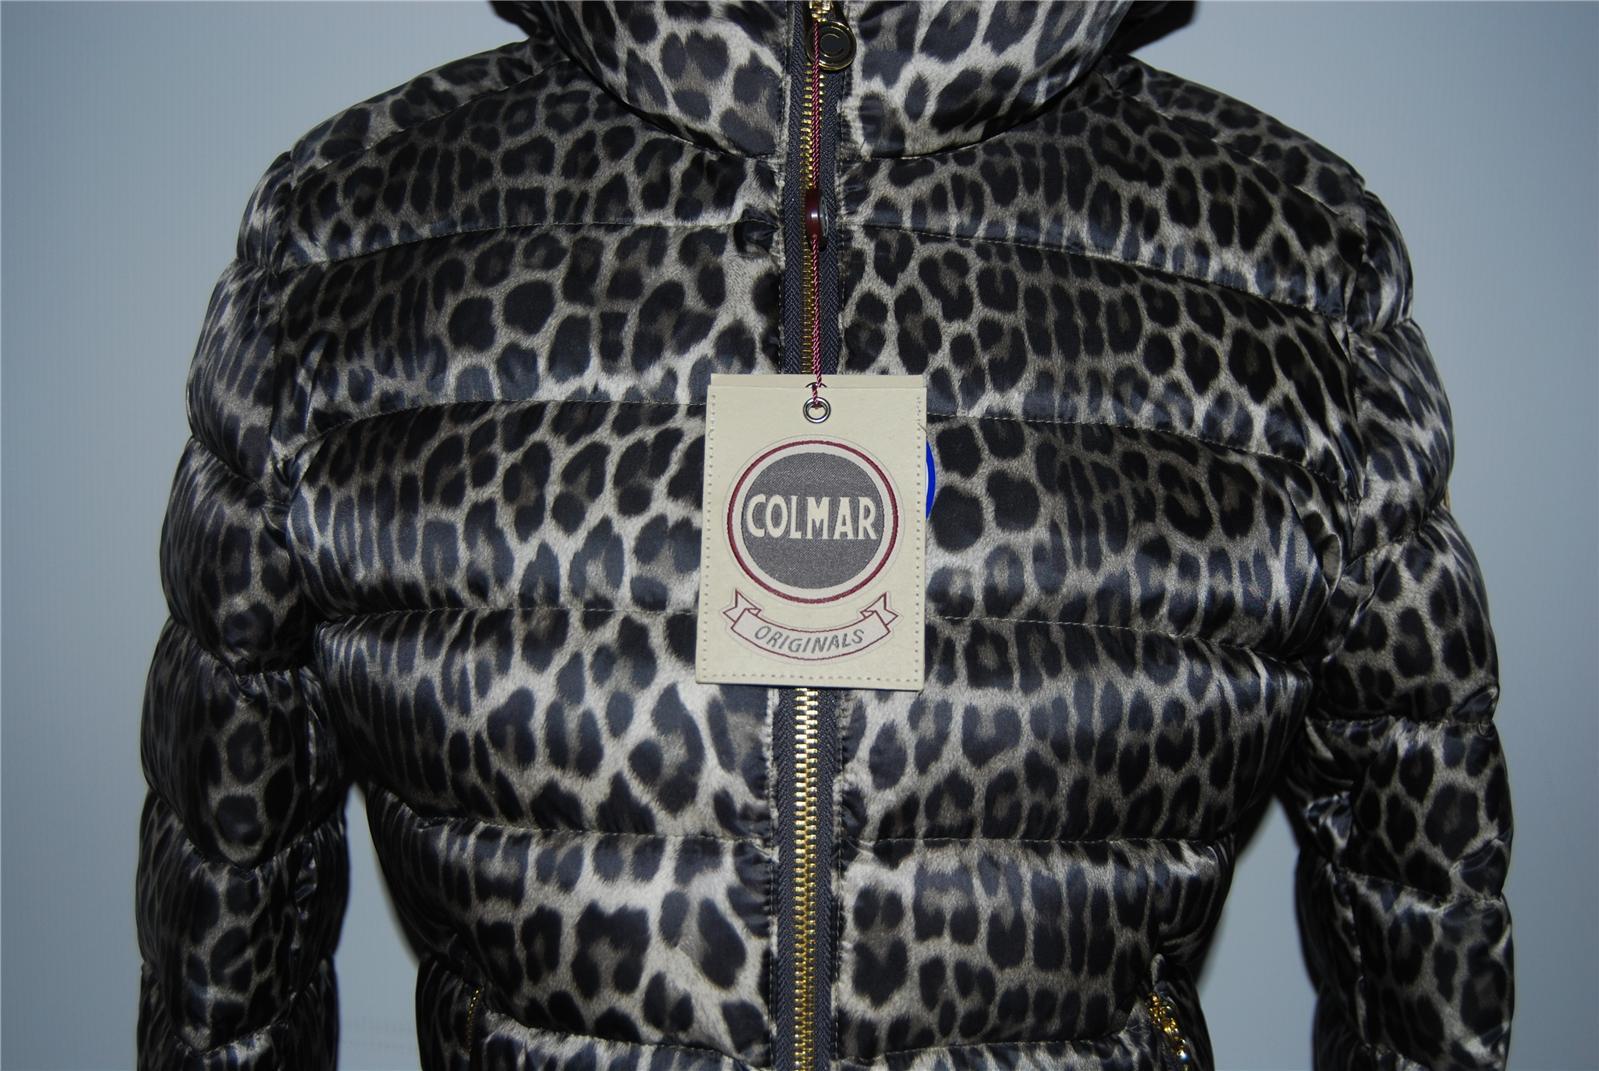 new product 89b71 8d5b8 PIUMINO COLMAR LEOPARDATO MACULATO Q3